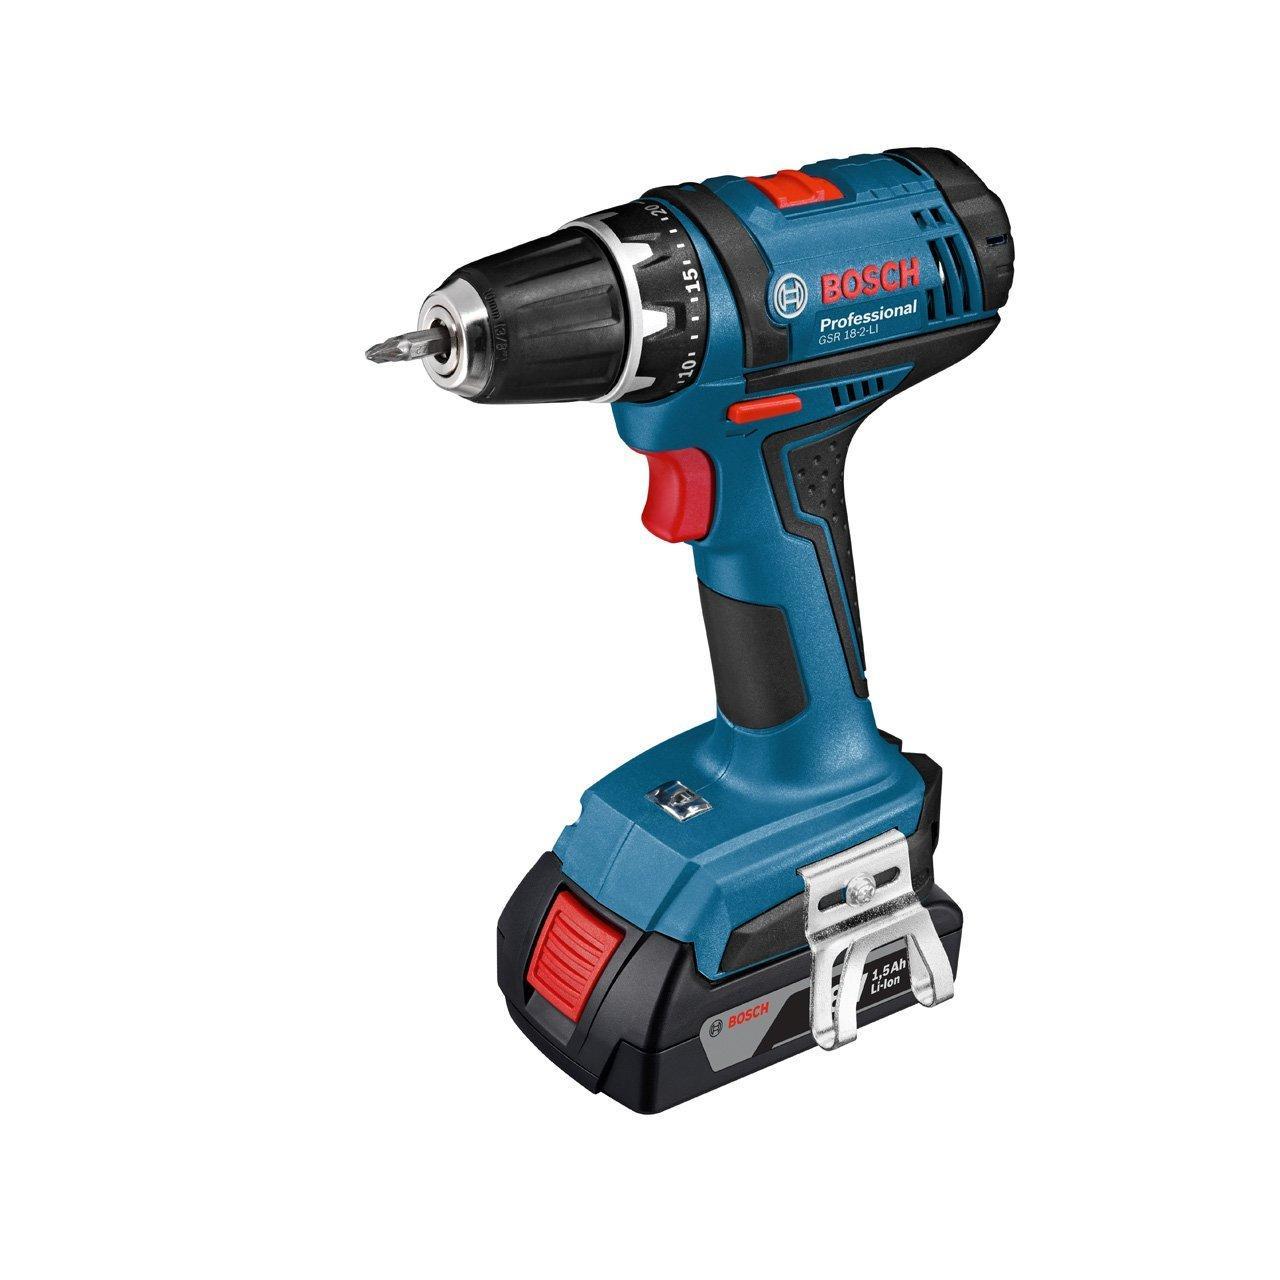 Perceuse-visseuse sans fil Bosch Professional 06019B7300 GSR 18-2-Li